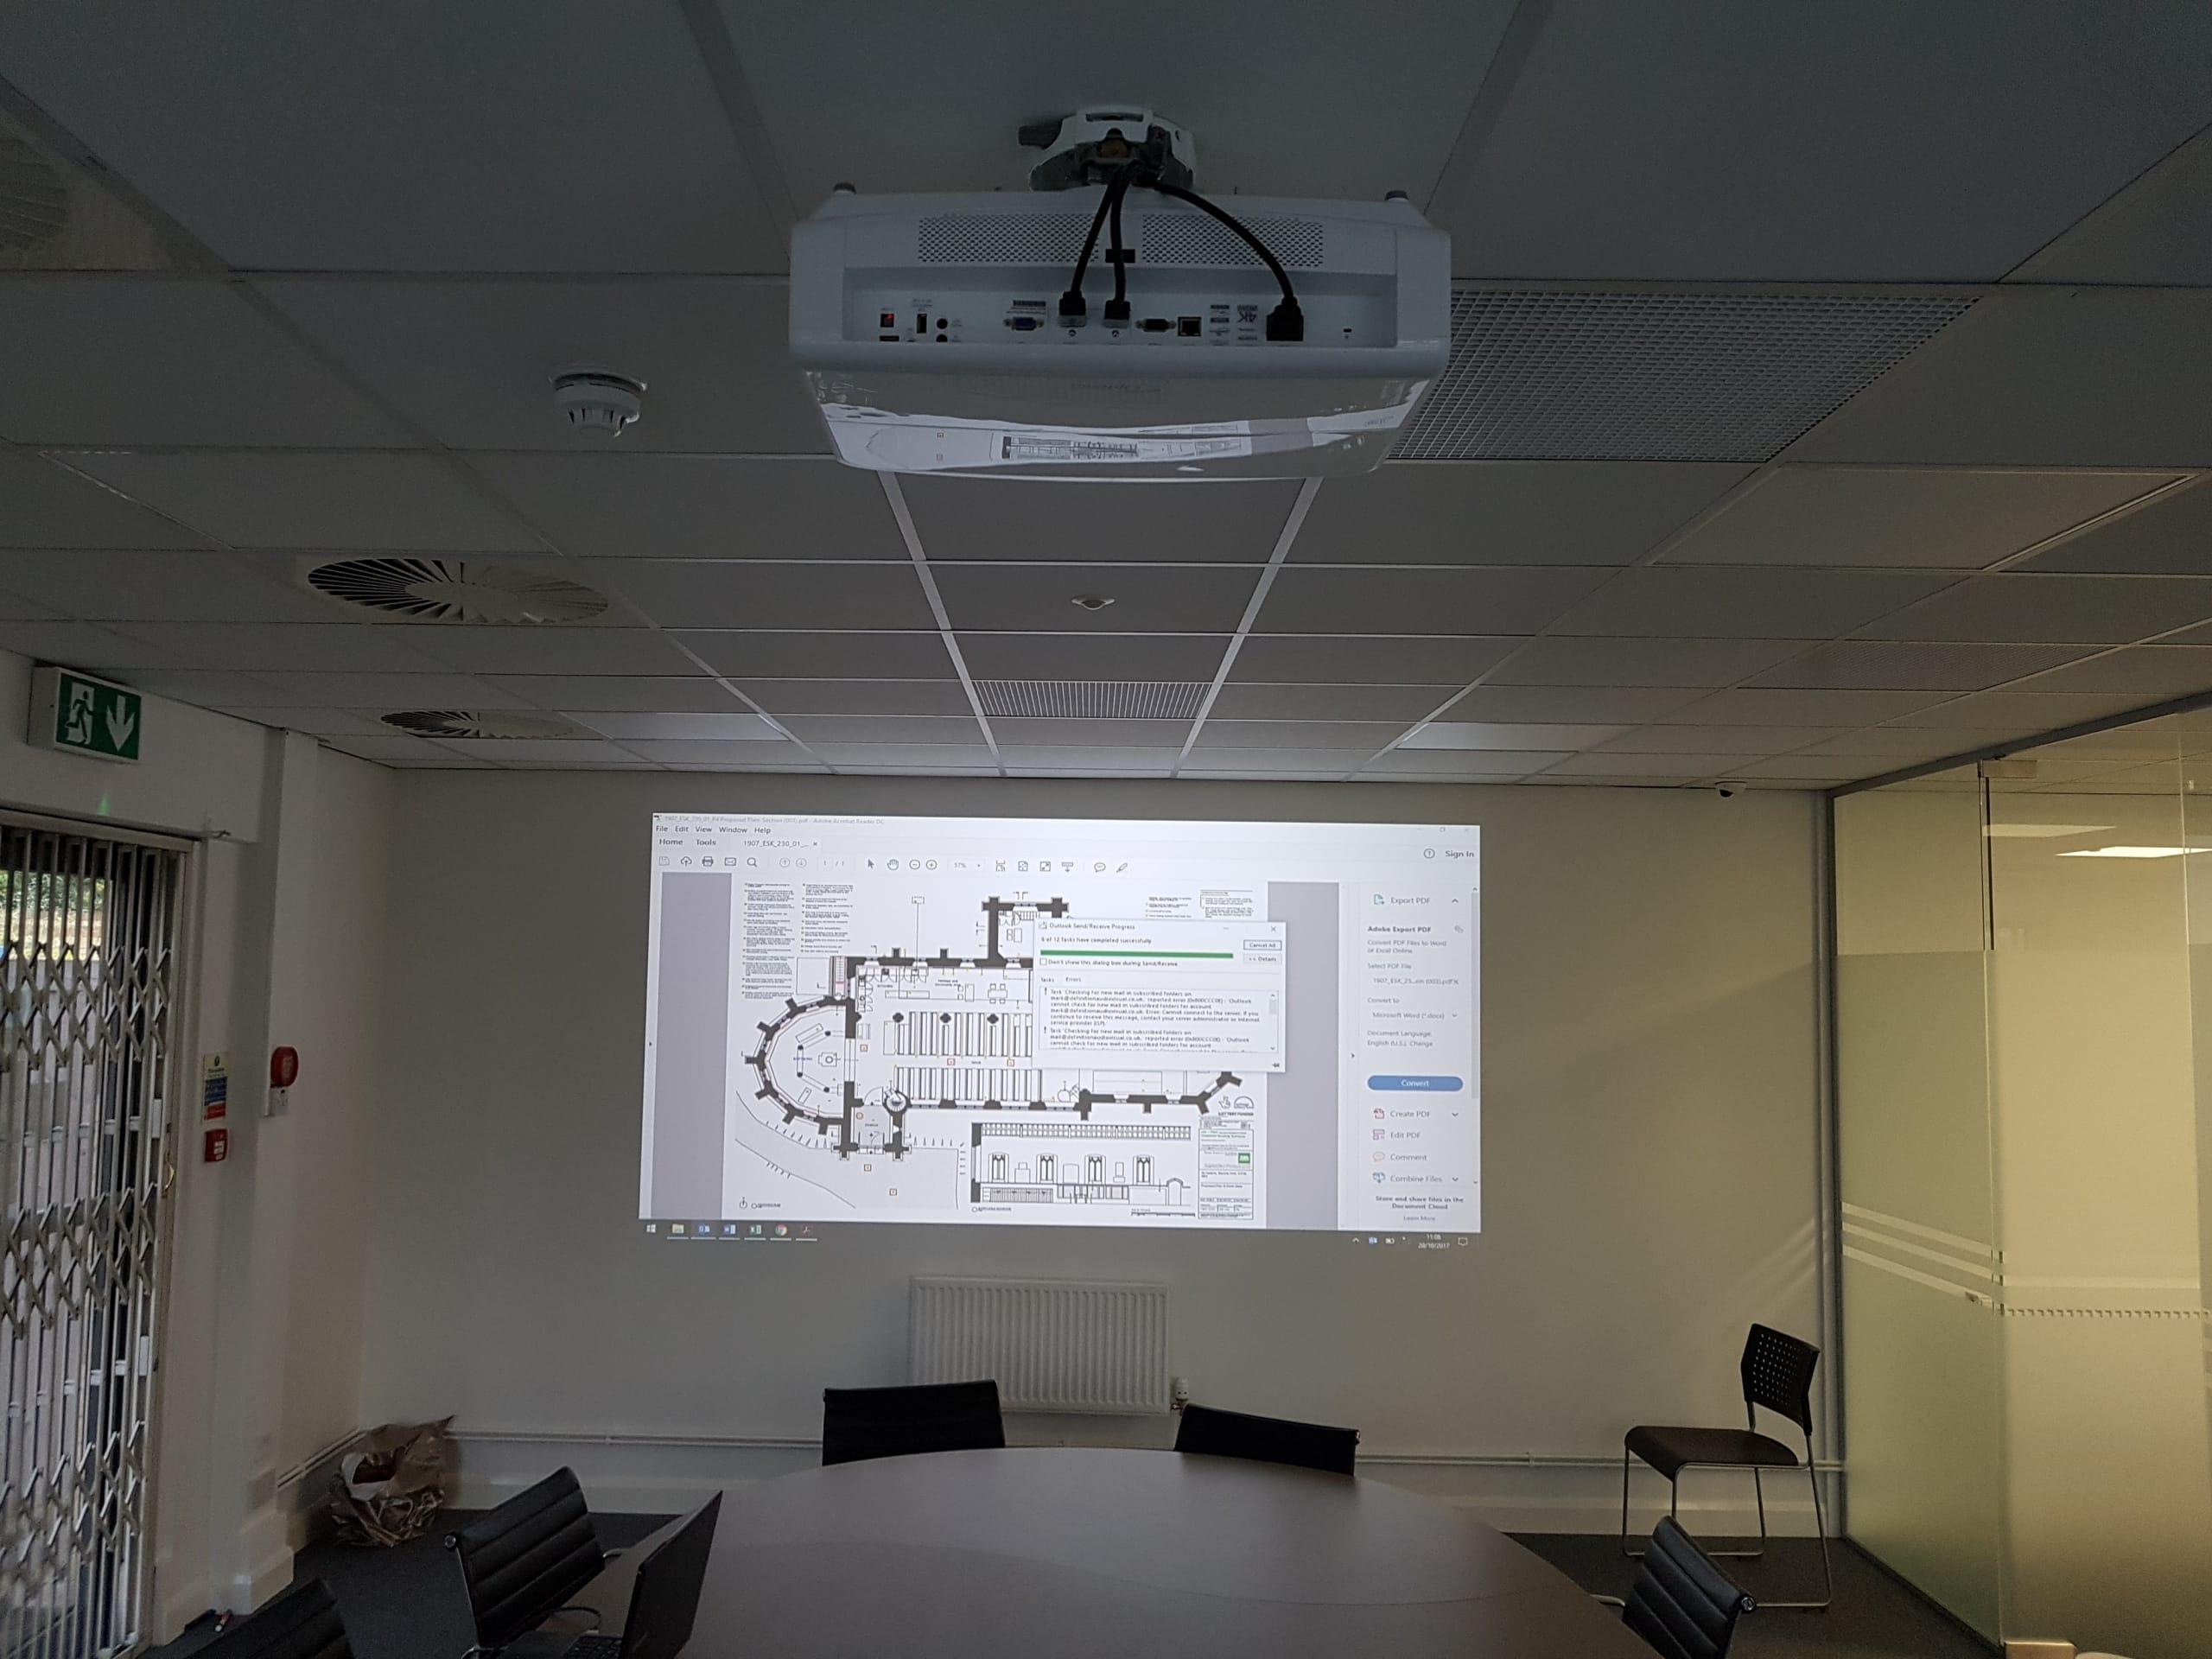 projector installation services bradford